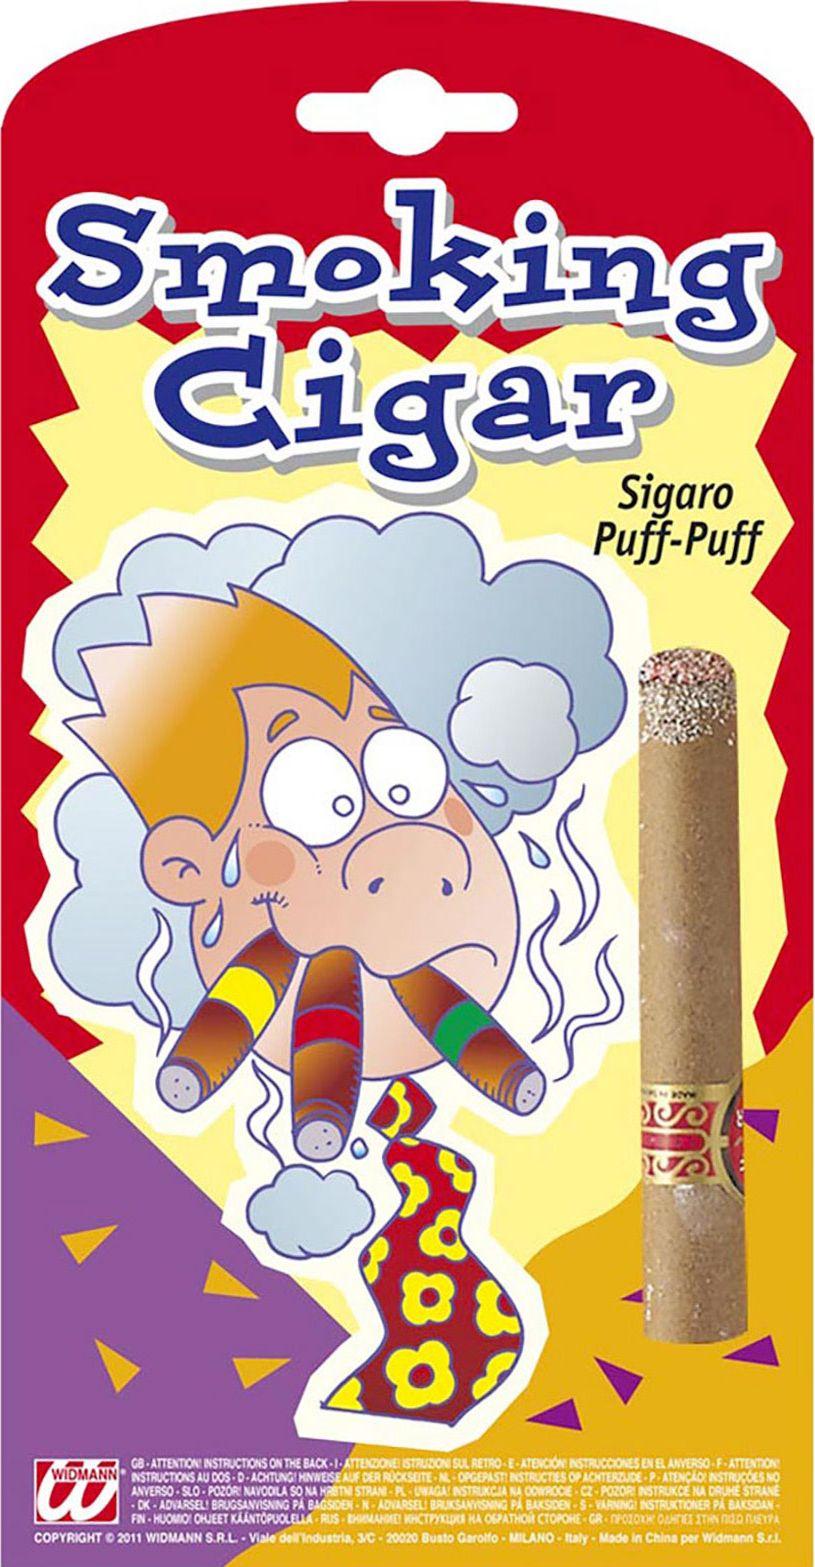 Neppe sigaar